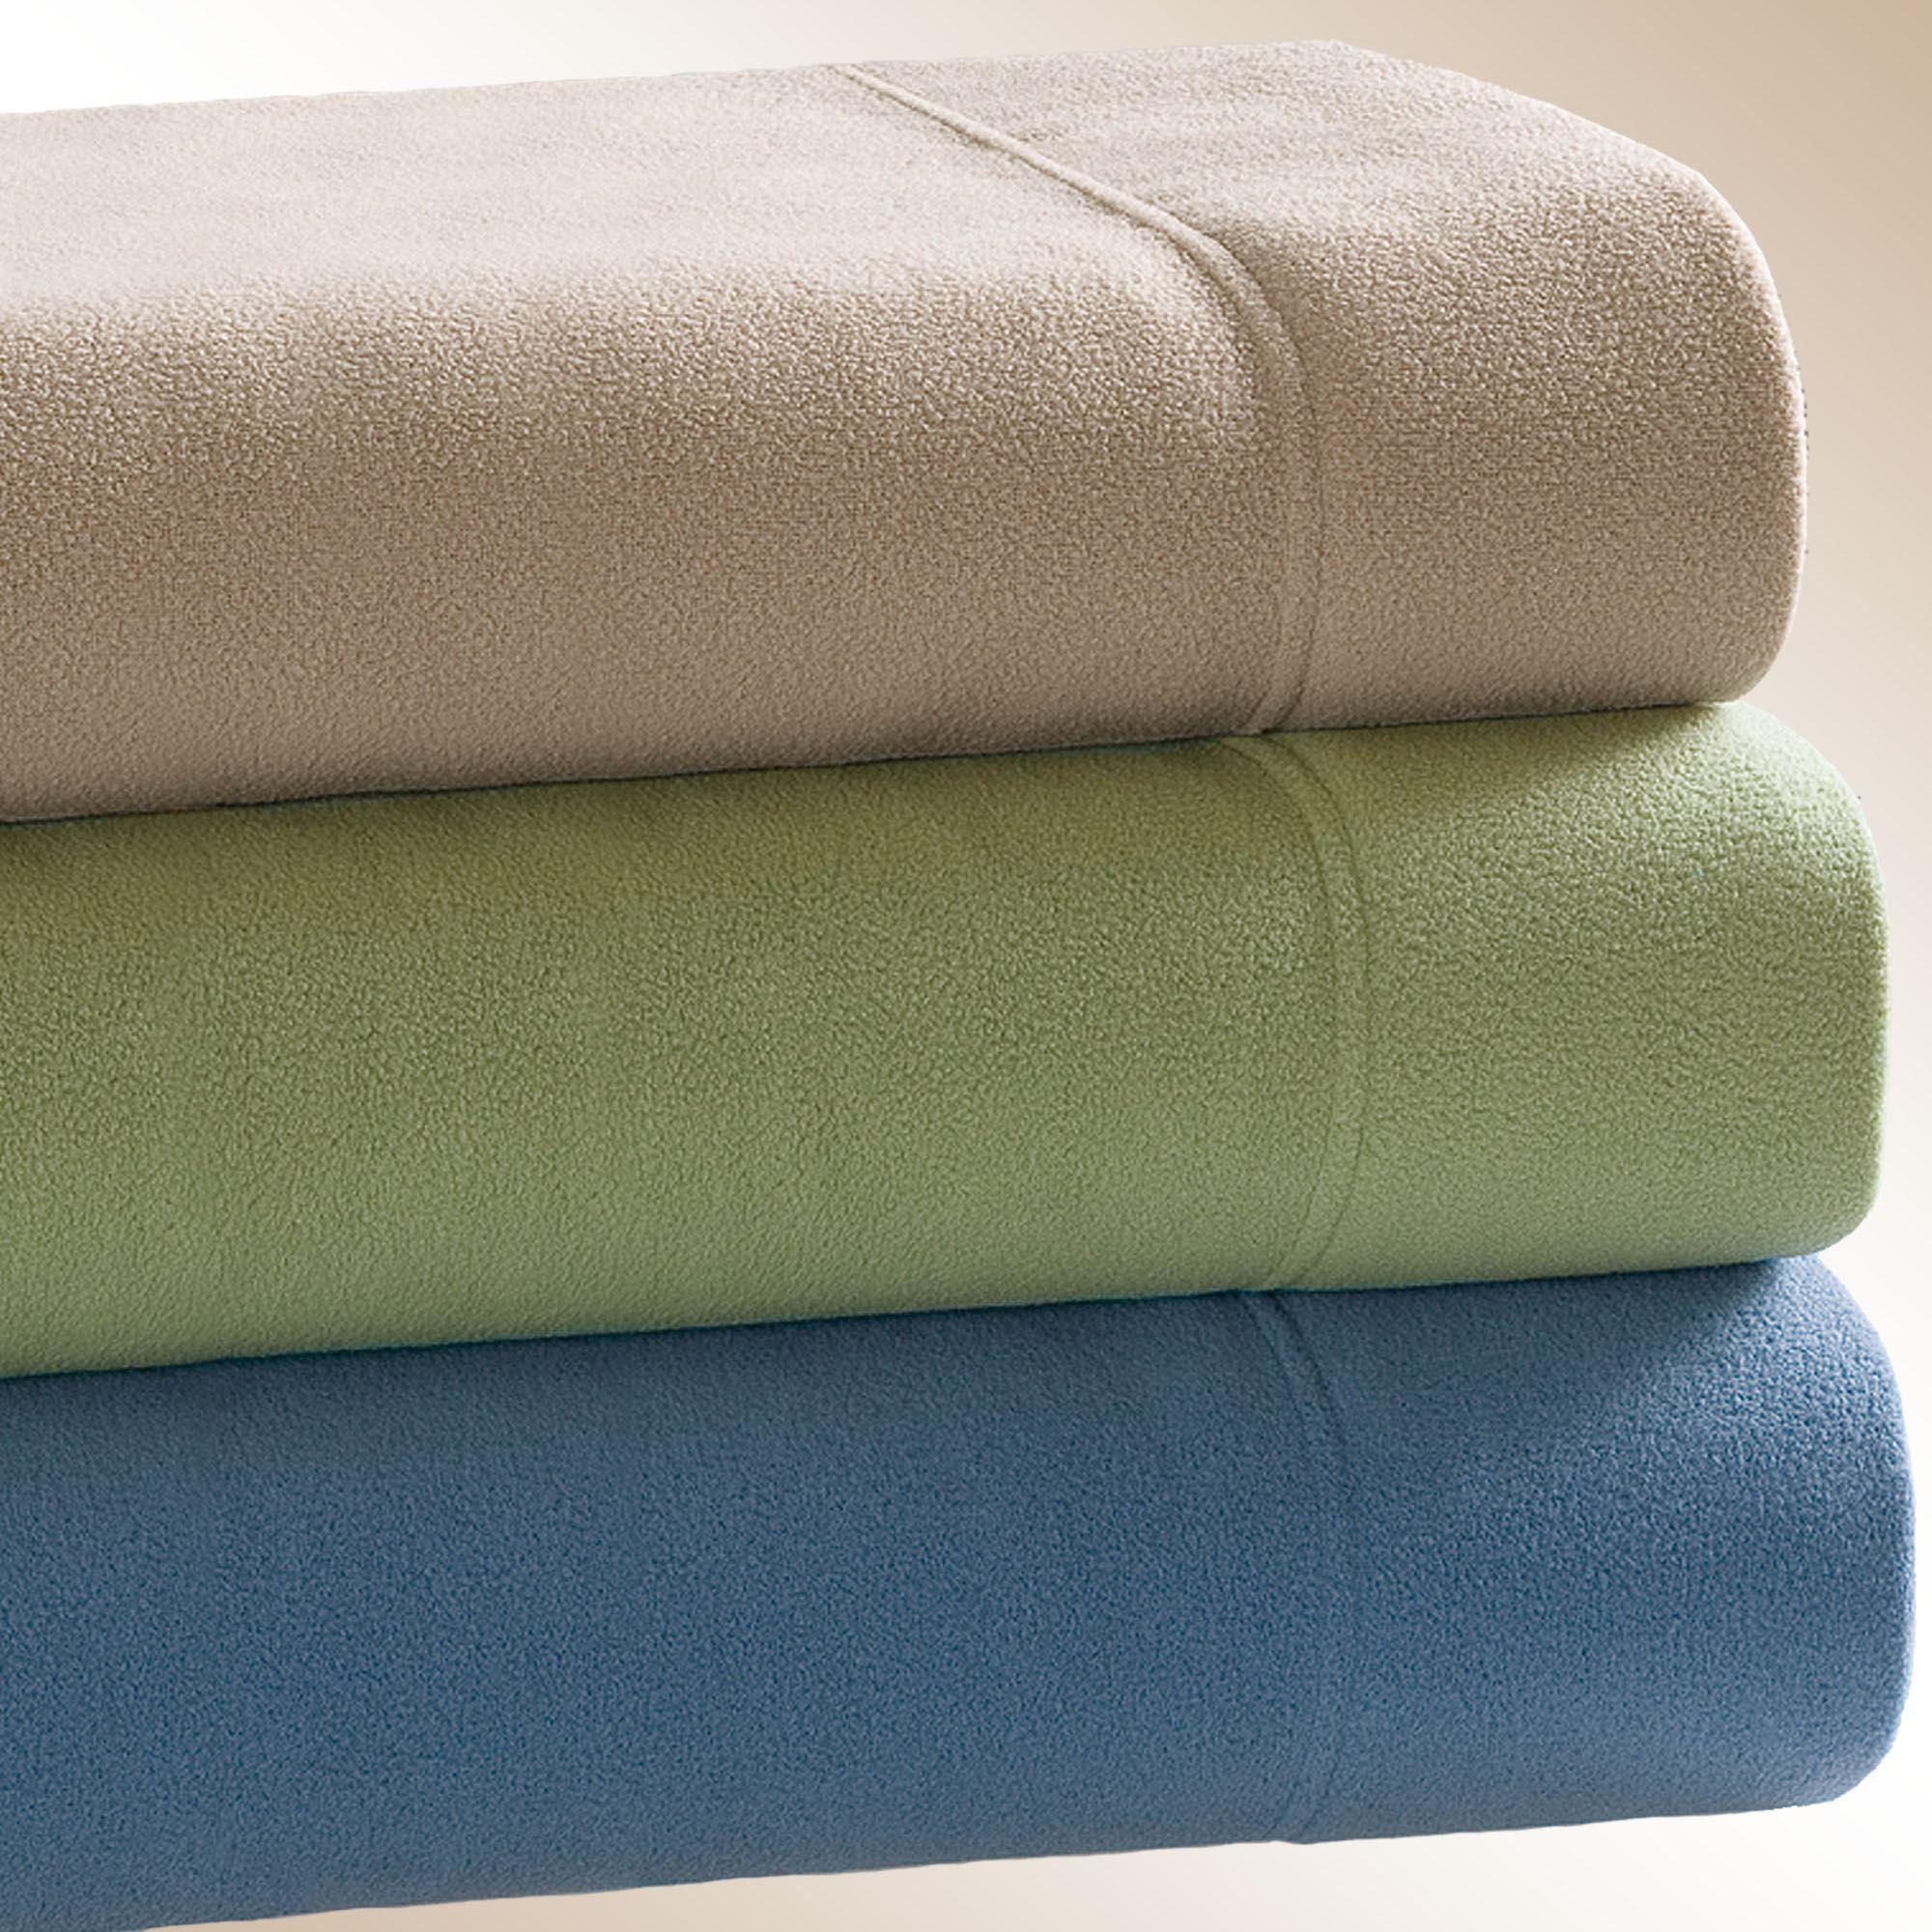 200 Gsm Micro Fleece Sheet Sets